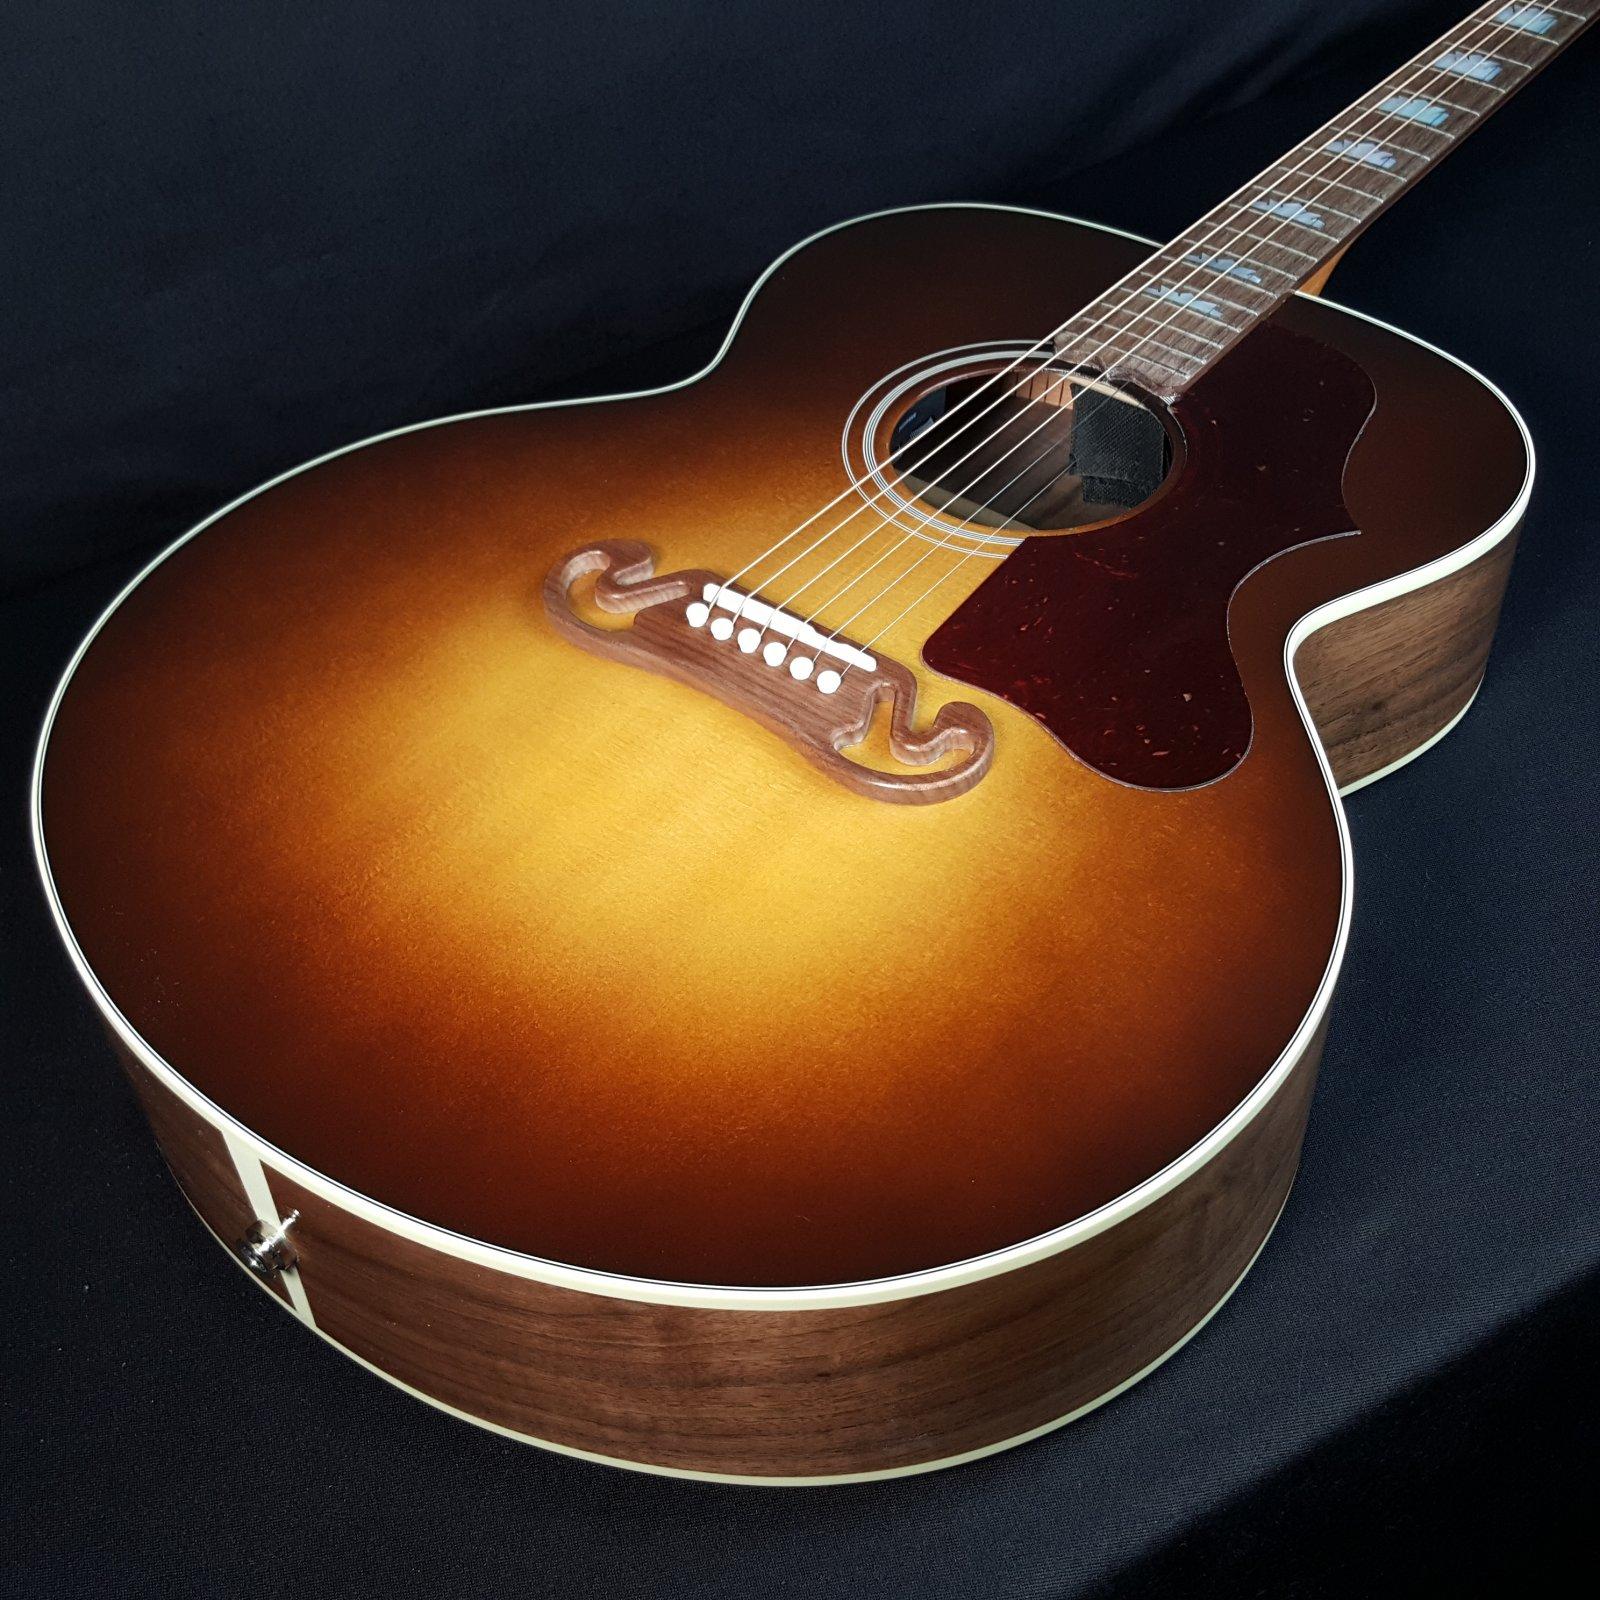 Gibson SJ-200 Studio Walnut Burst Jumbo Acoustic Electric Guitar